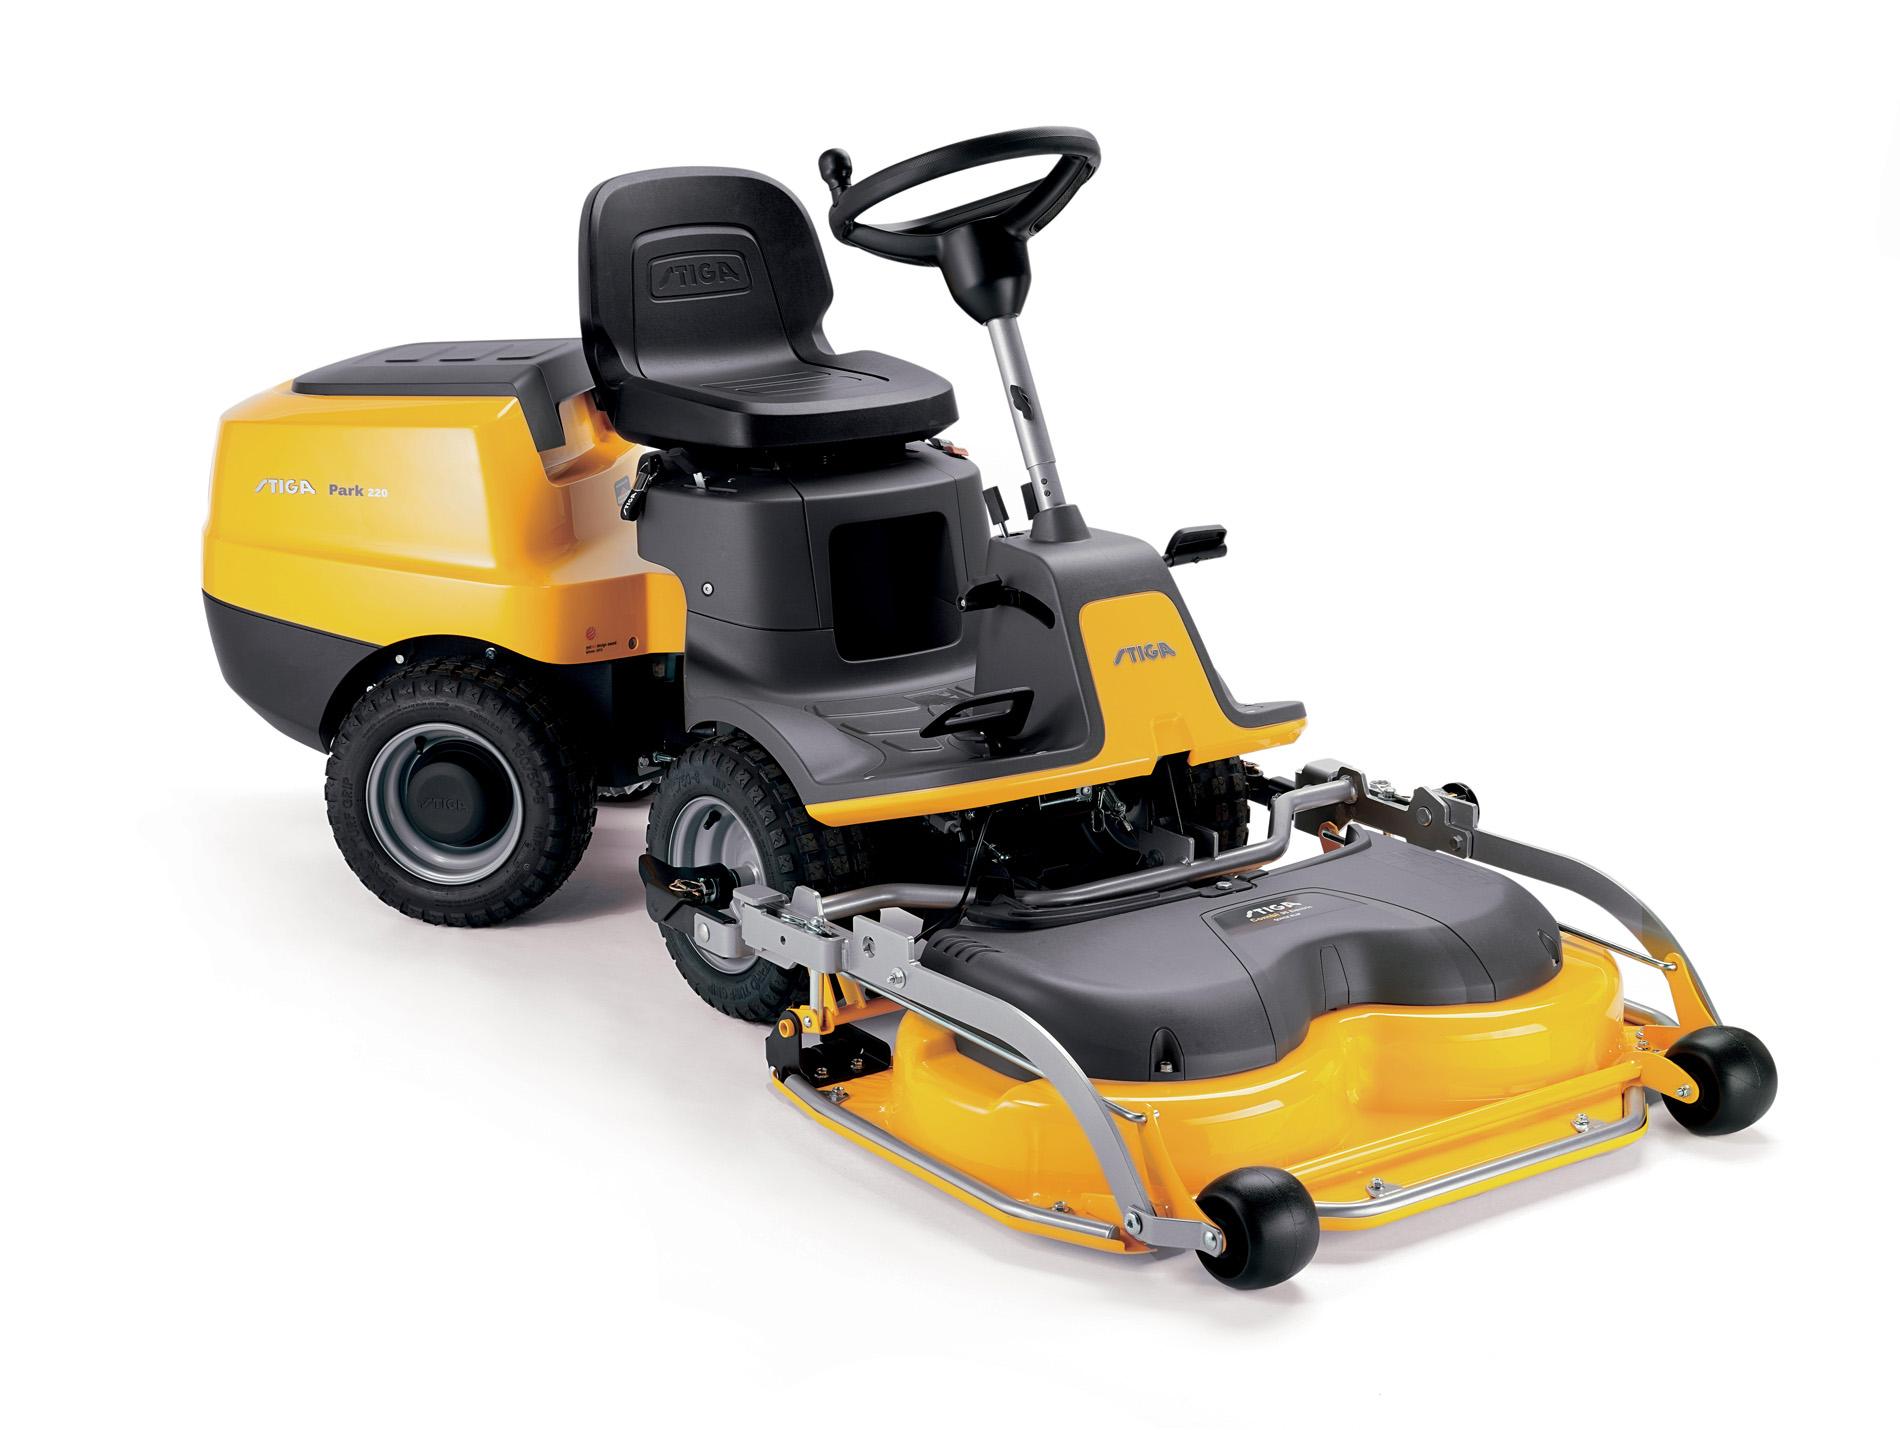 tracteur tondeuse coupe frontale stiga park220 344cc. Black Bedroom Furniture Sets. Home Design Ideas